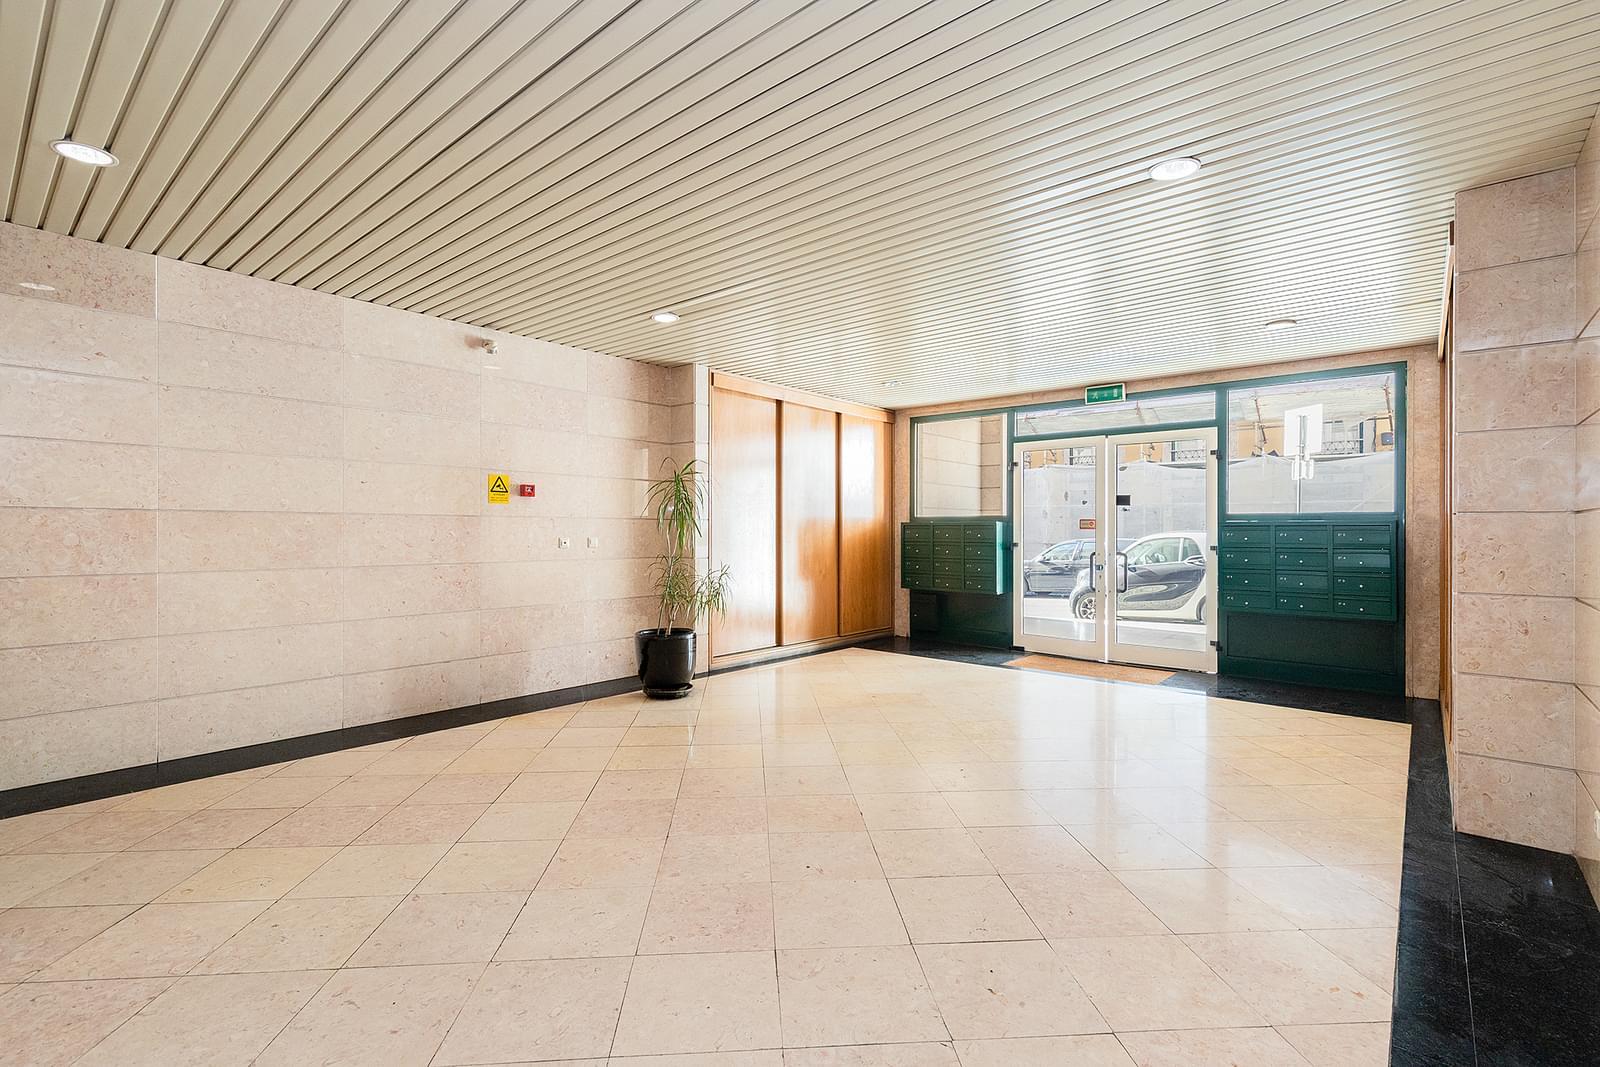 pf18967-apartamento-t2-lisboa-4b065e64-689f-4a5f-9ae0-1c0b6c3b56f6